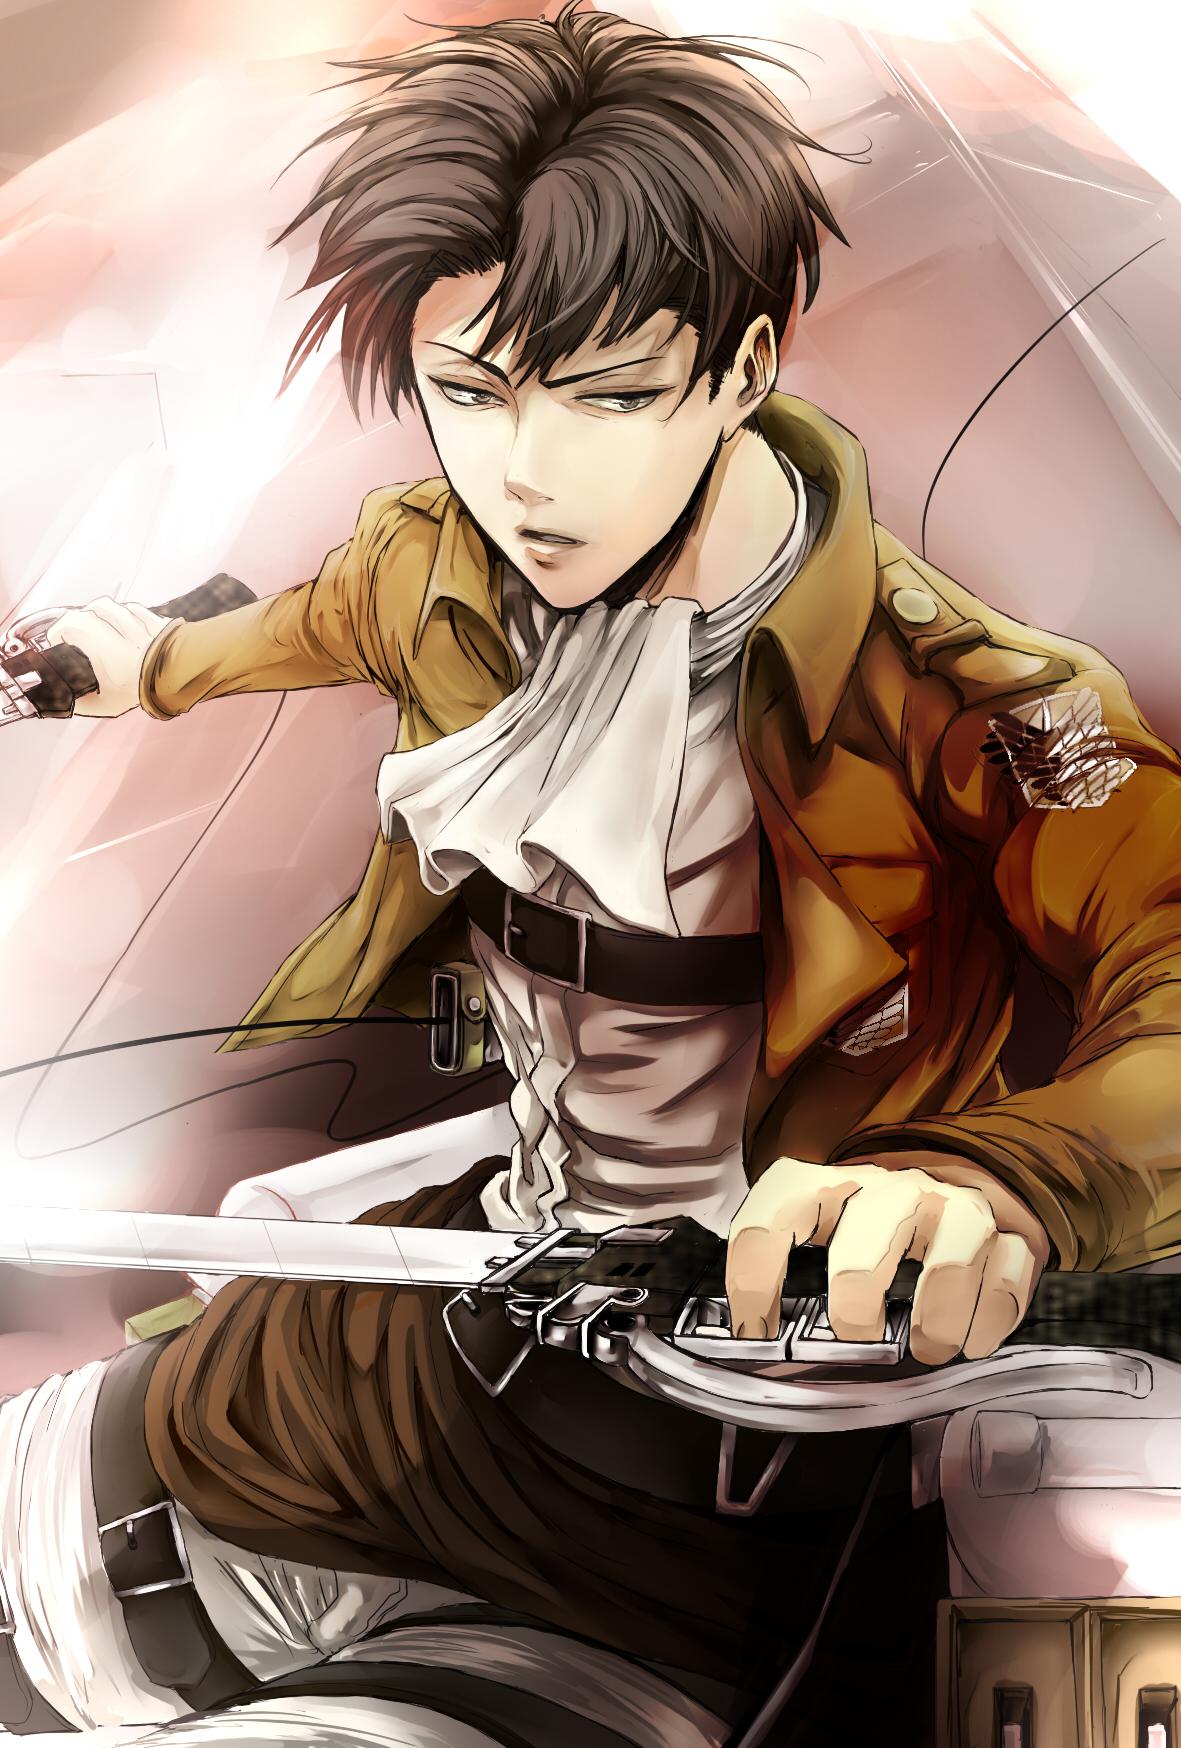 Pixiv Id 3502273 - Zerochan Anime Image Board